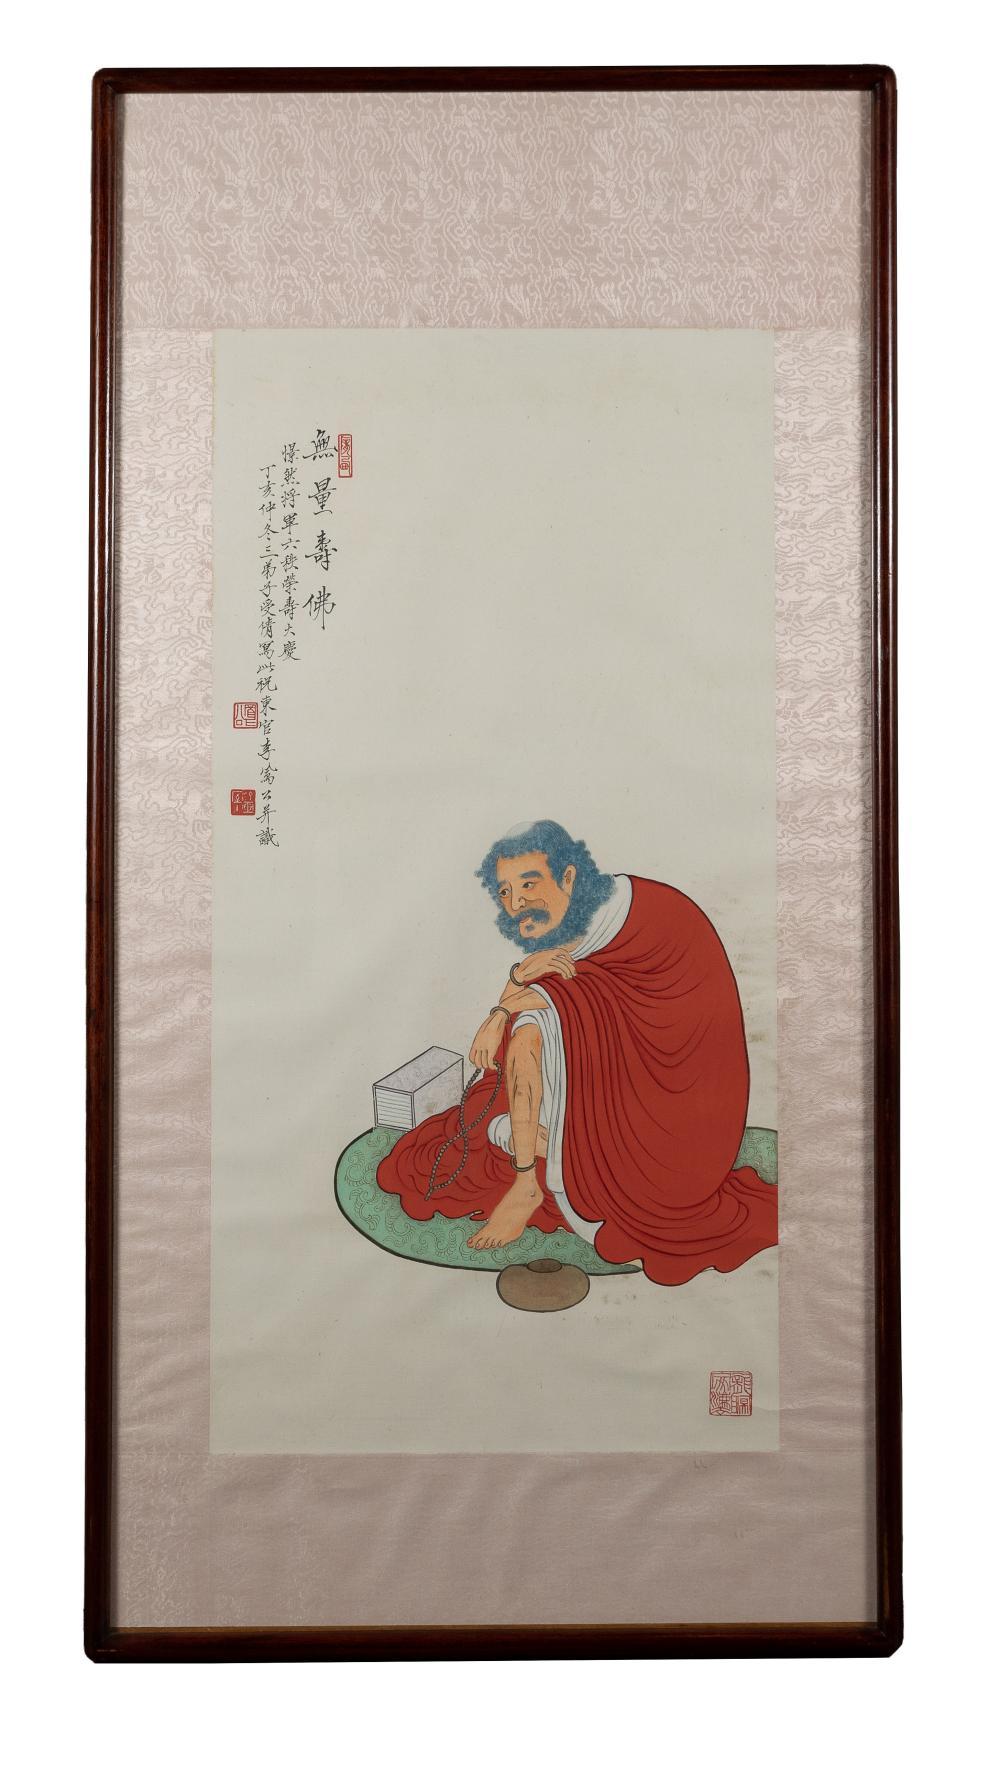 CHINESE PAINTING OF A BUDDHA BY LI FENGGONG